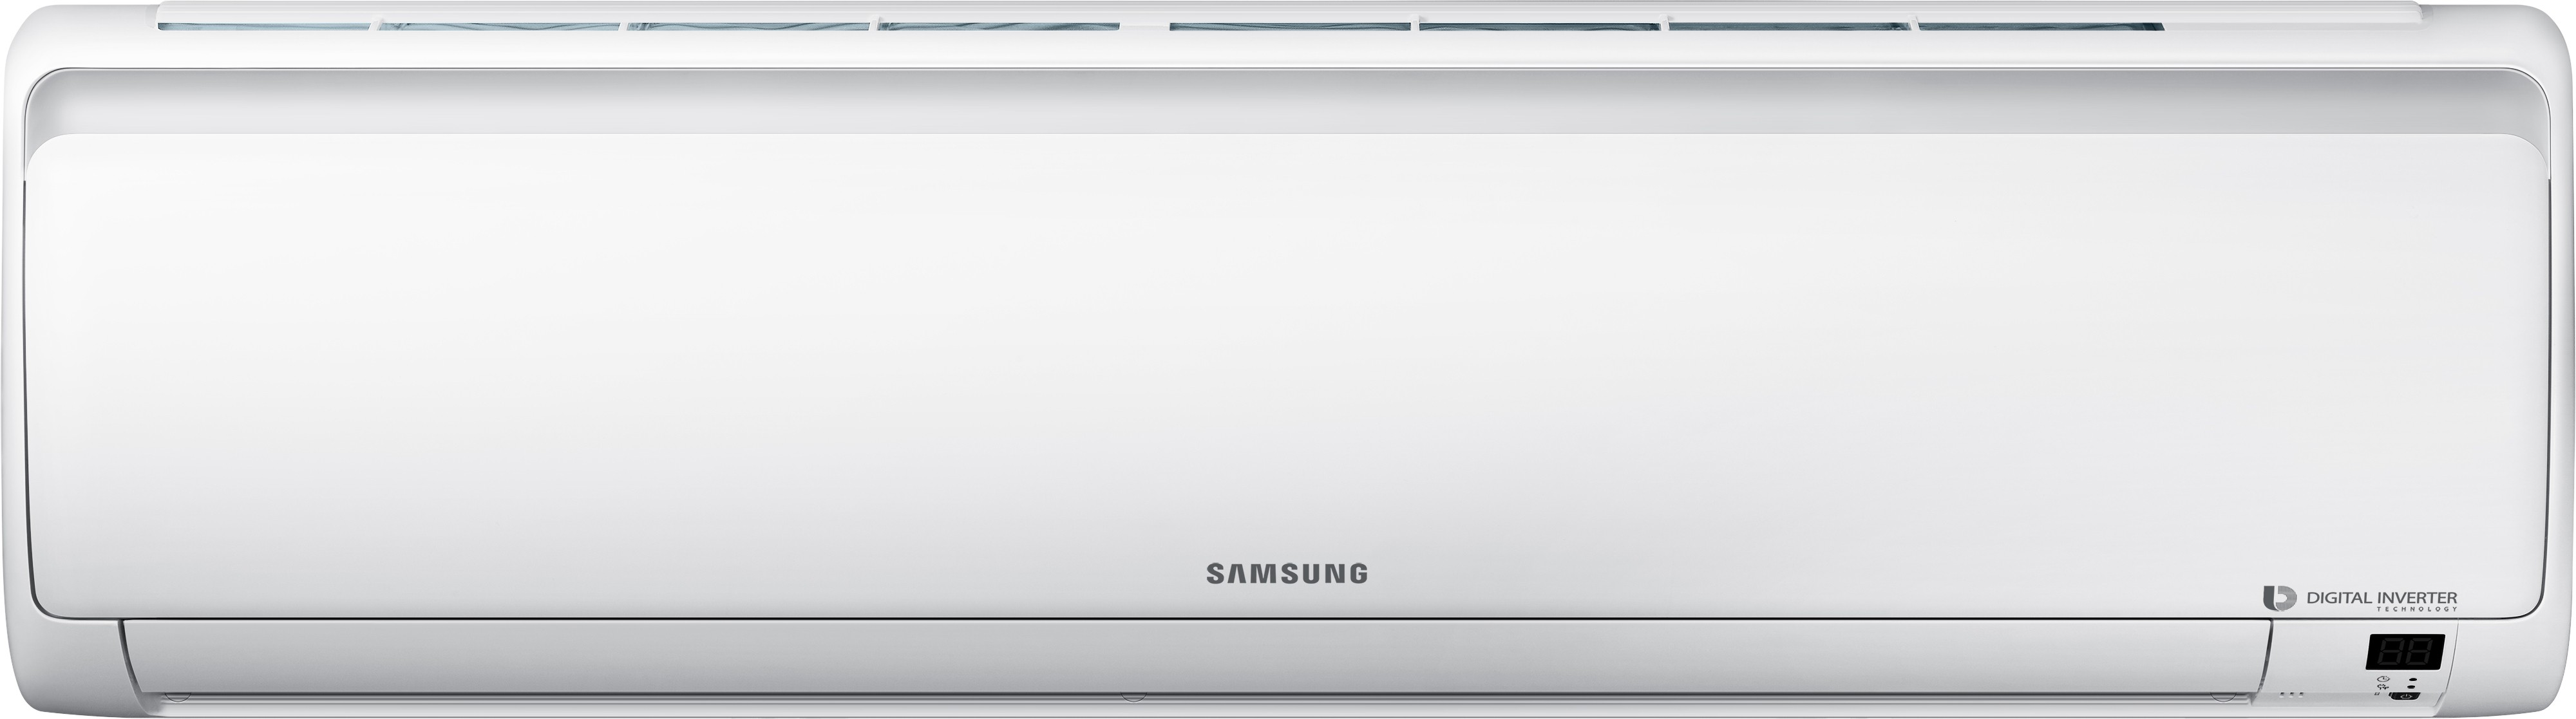 Samsung AR18NV5PAWK 1.5 Ton 5 Star BEE Rating 2018 Split AC Image